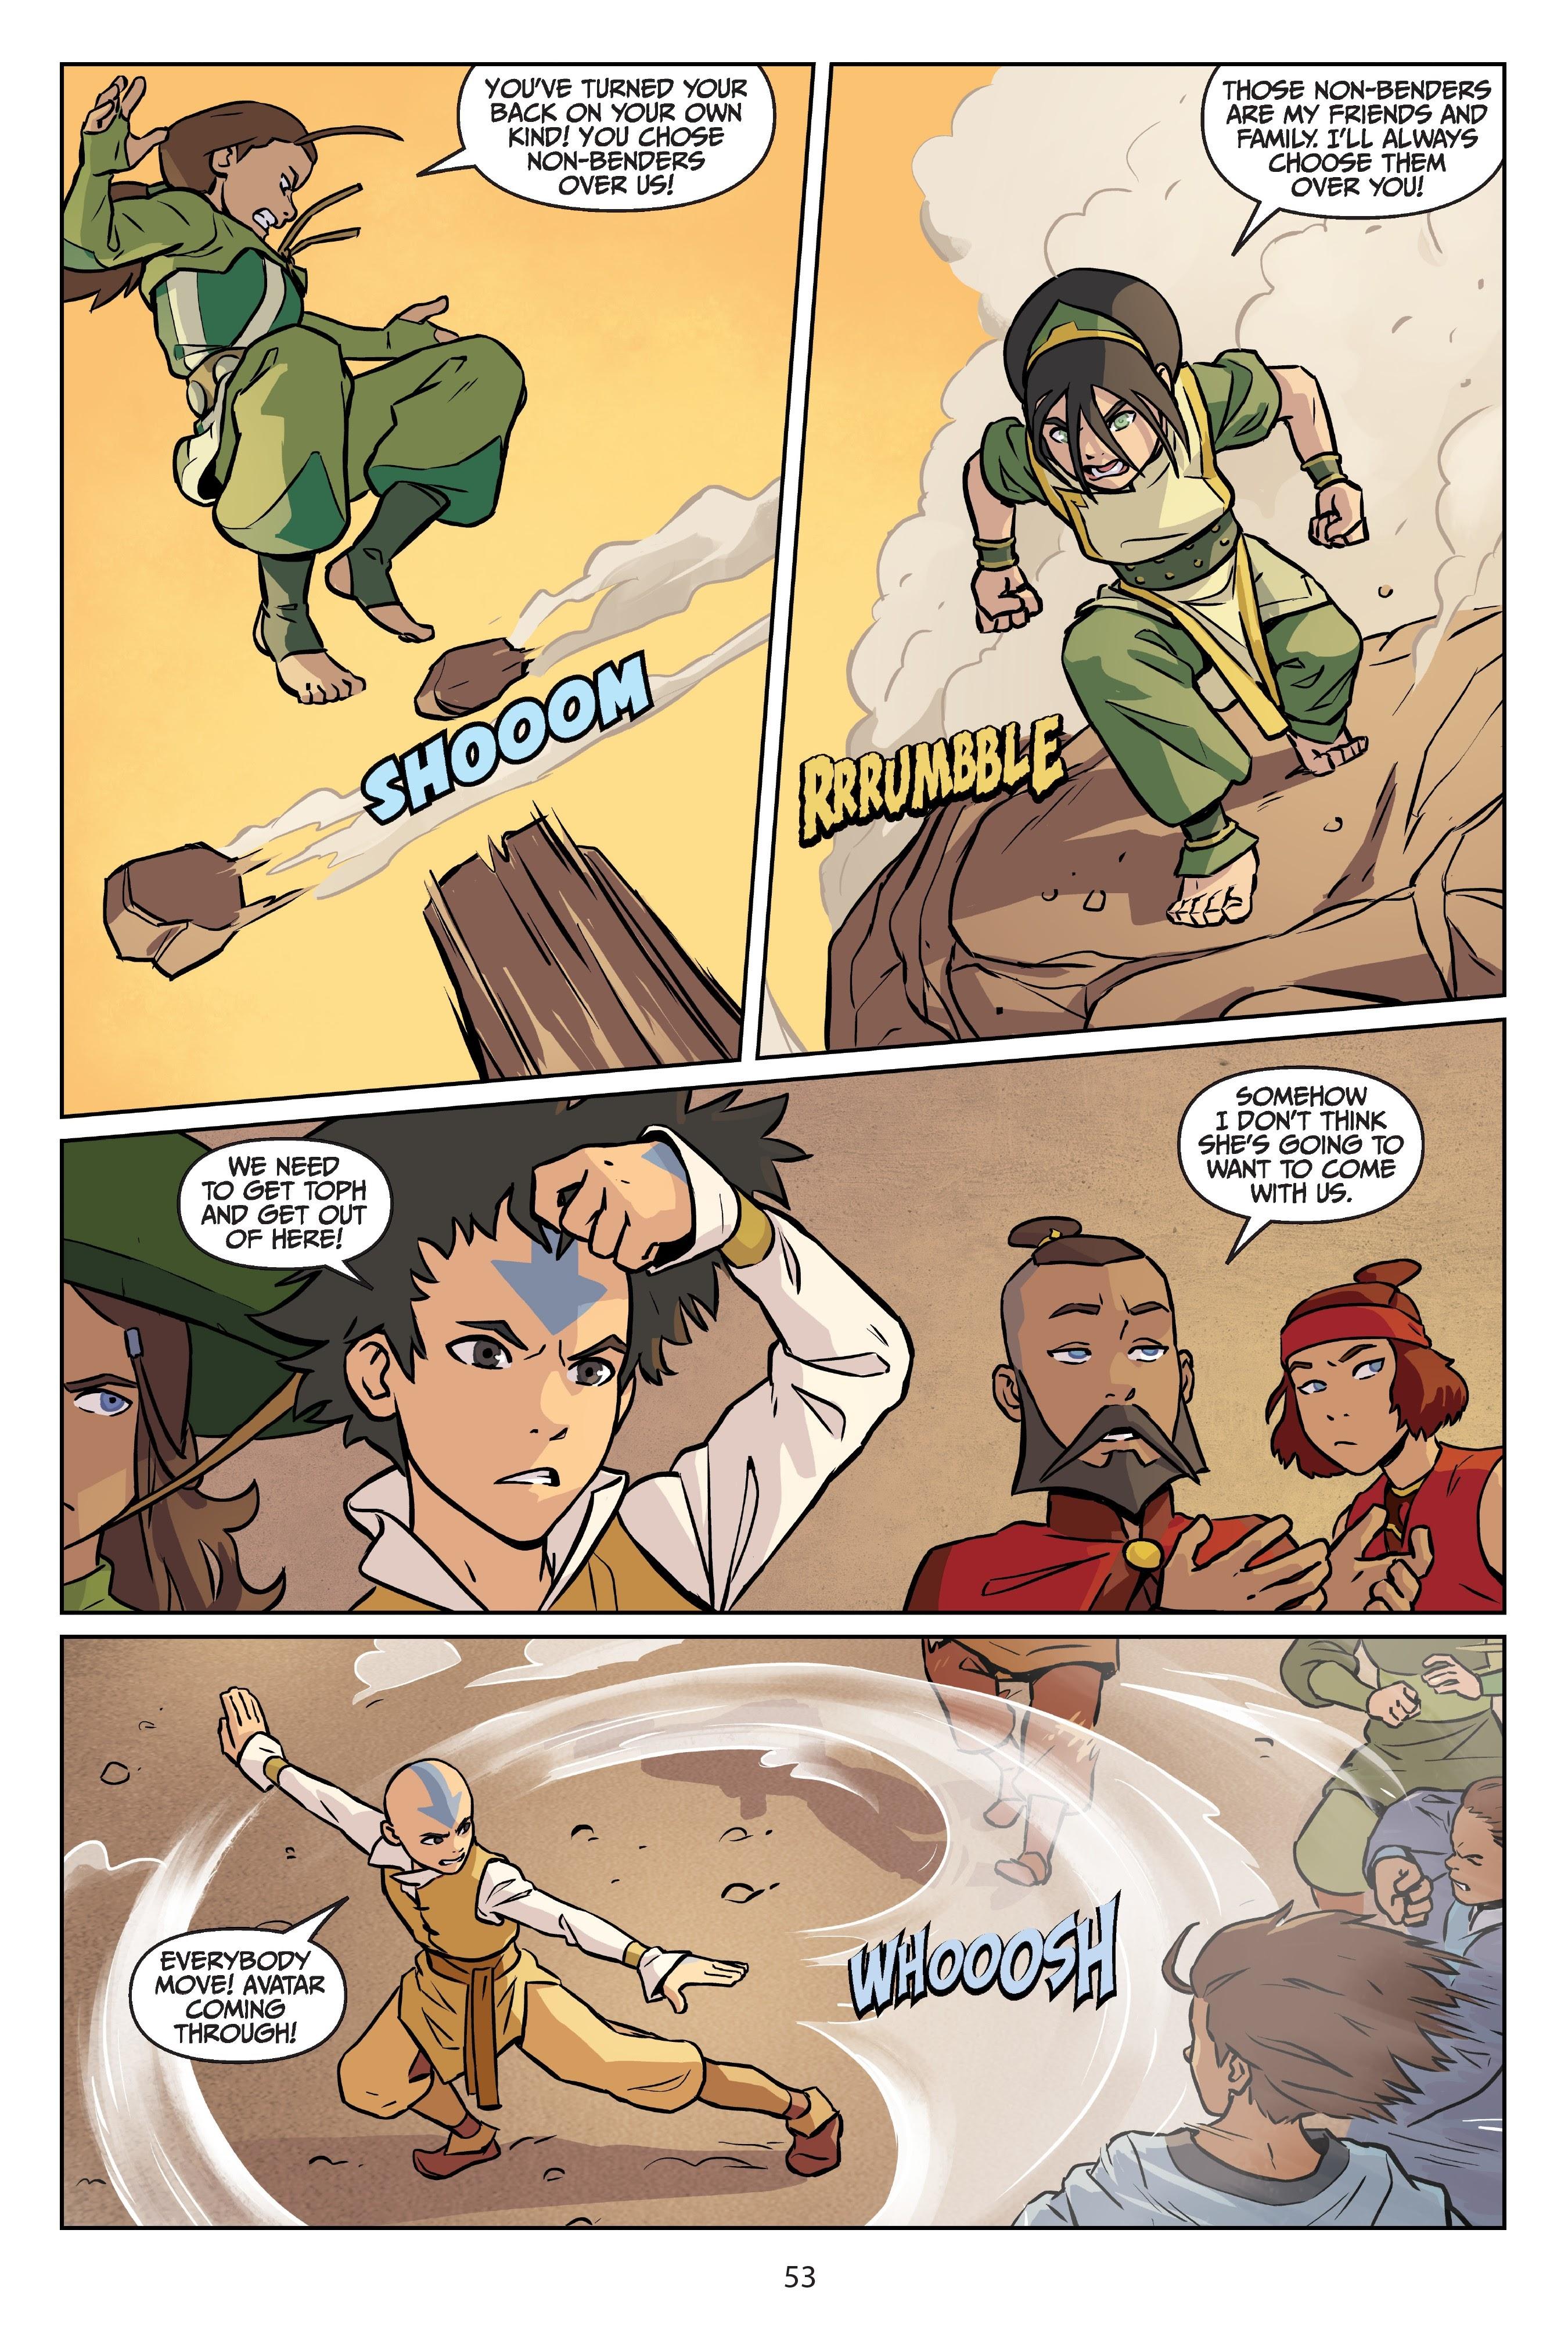 Nickelodeon Avatar: The Last Airbender - Imbalance TPB_2 Page 53